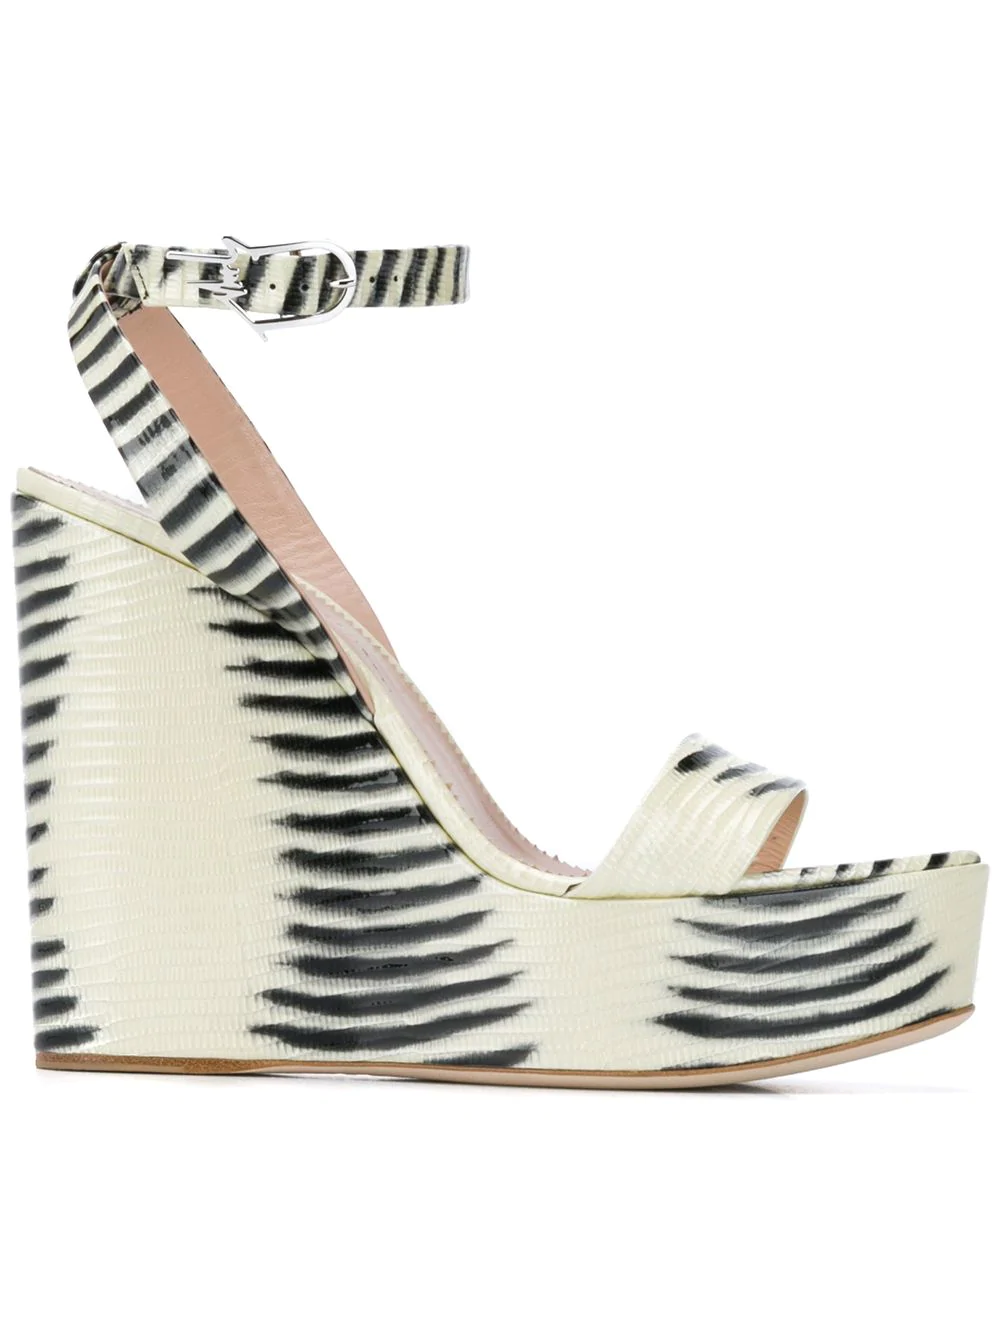 36f6696499 Giuseppe Zanotti Women's Gypsy Wedge Platform Sandals In White ...